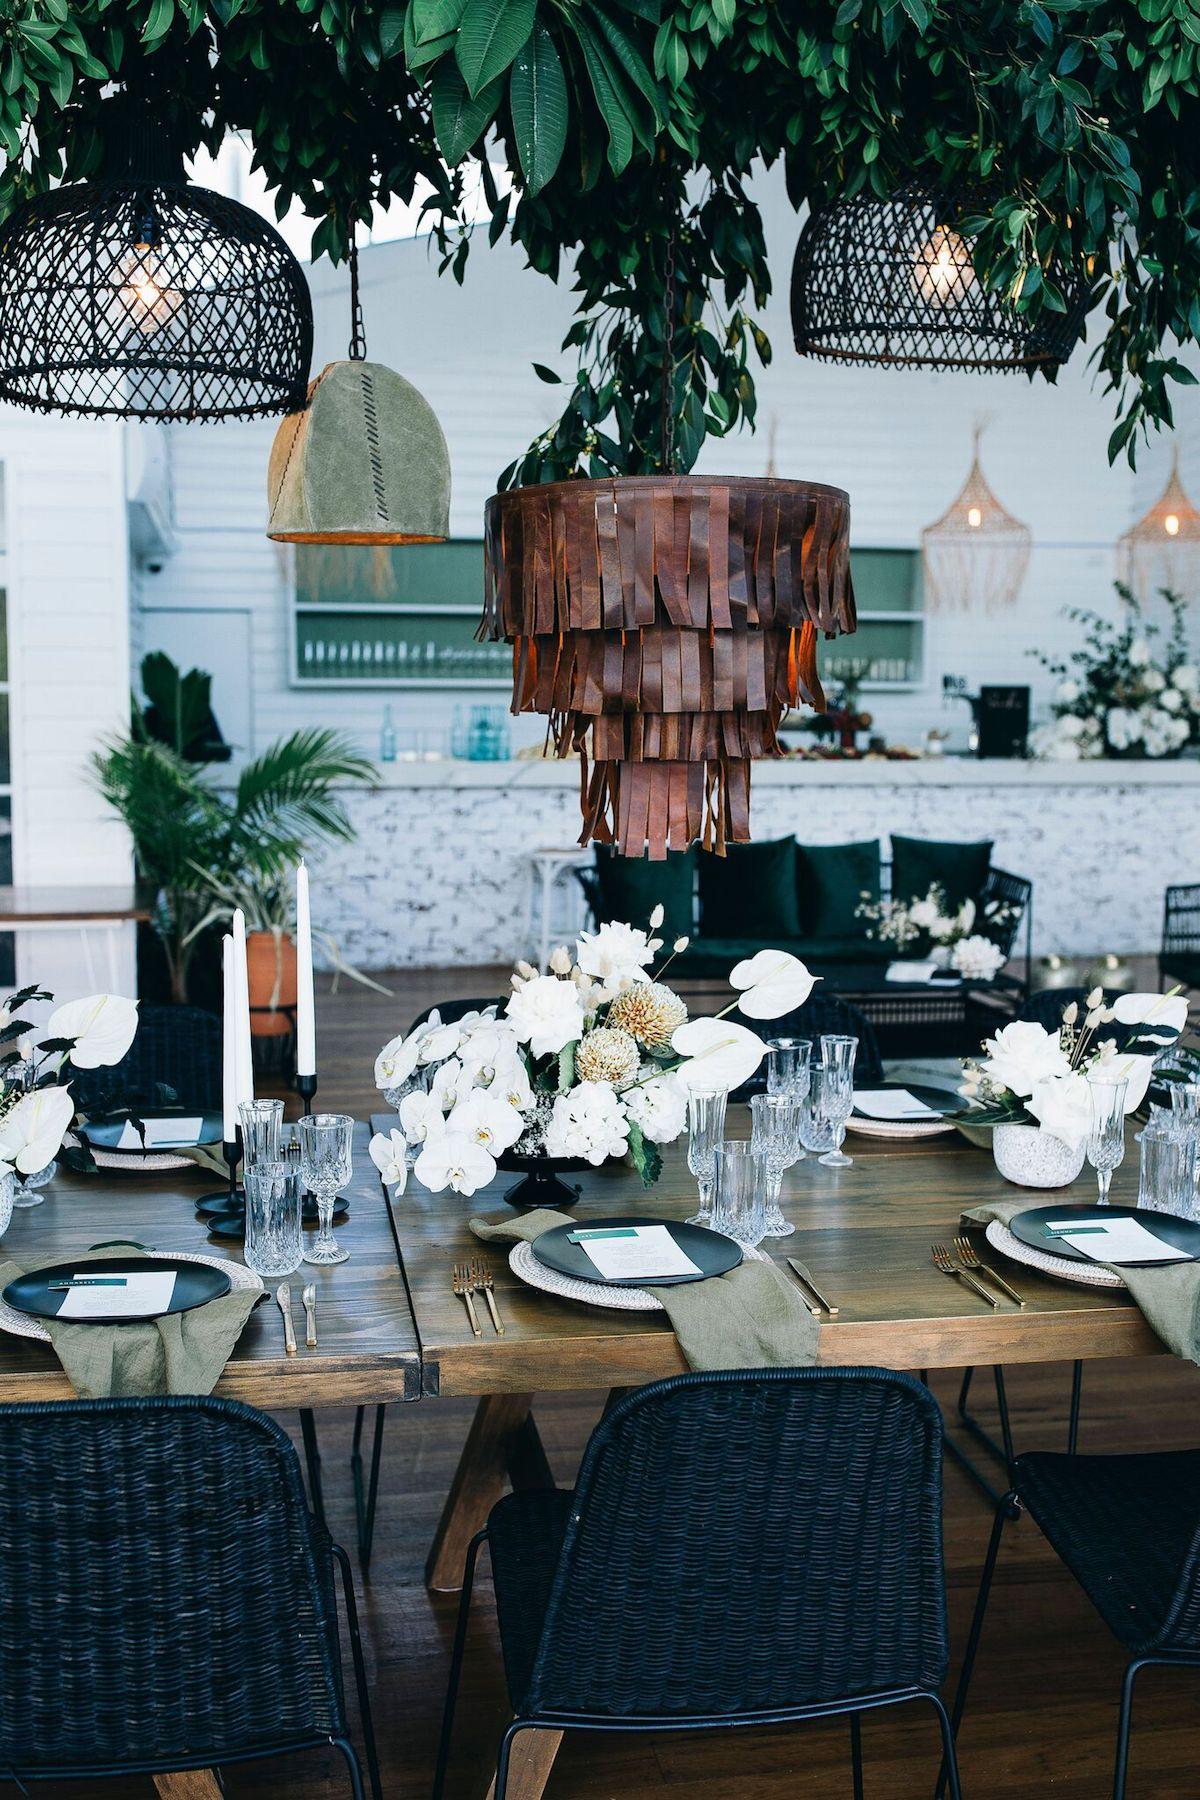 Linen Napkin Hire Wedding Styling Inspiration50.jpeg